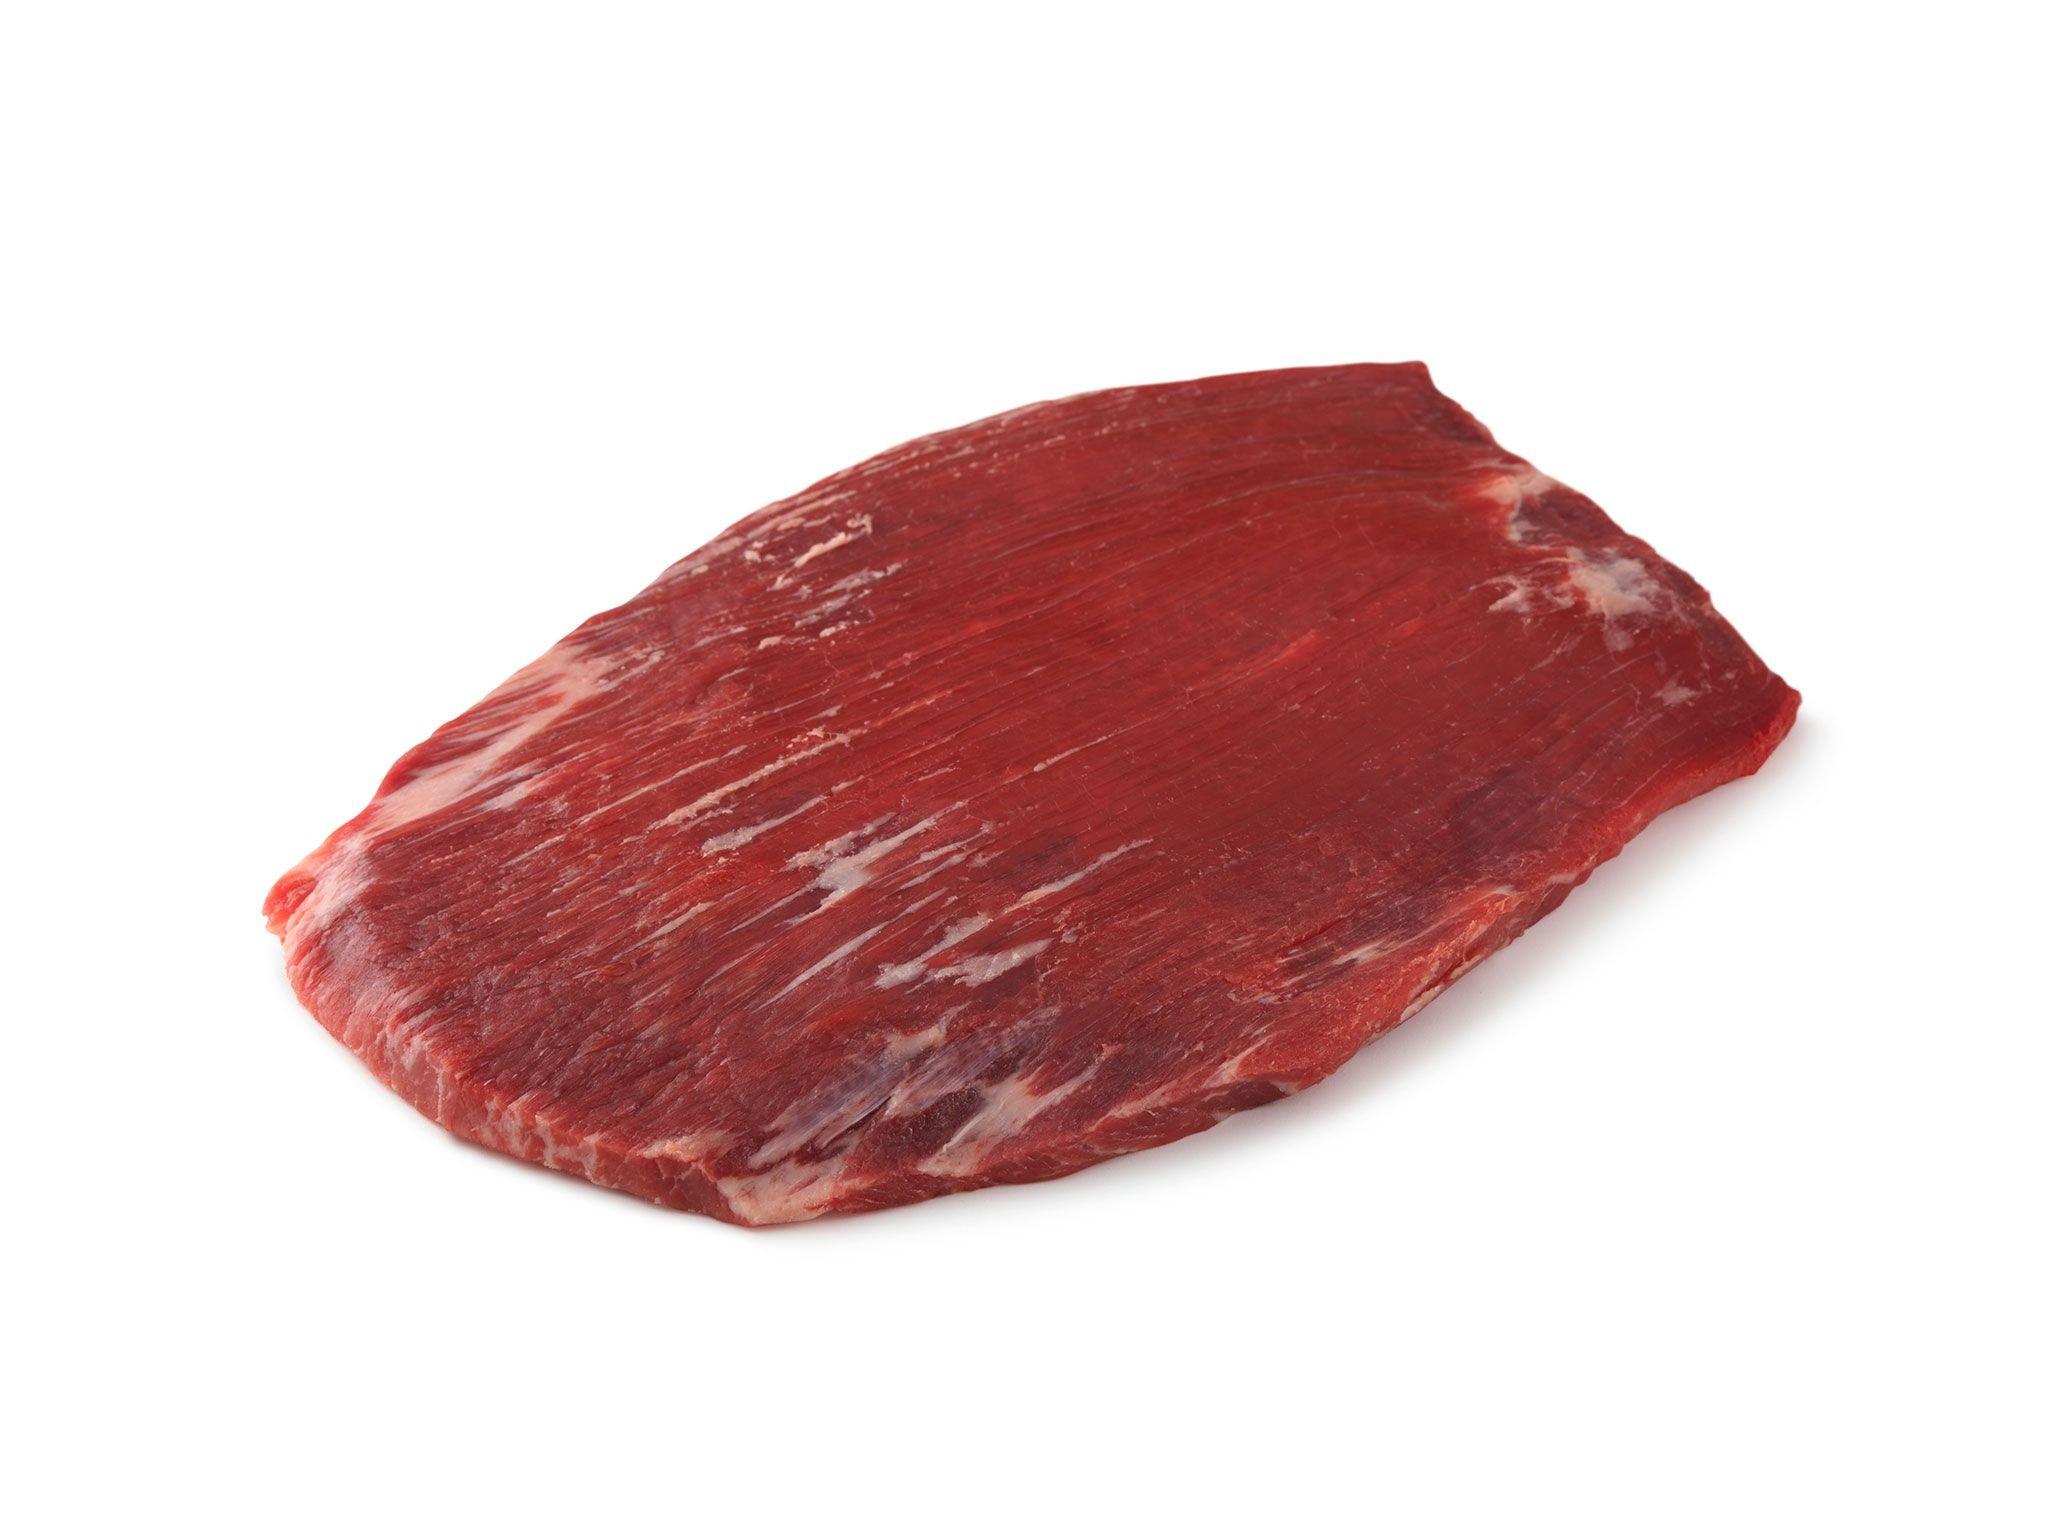 Raw flank steak